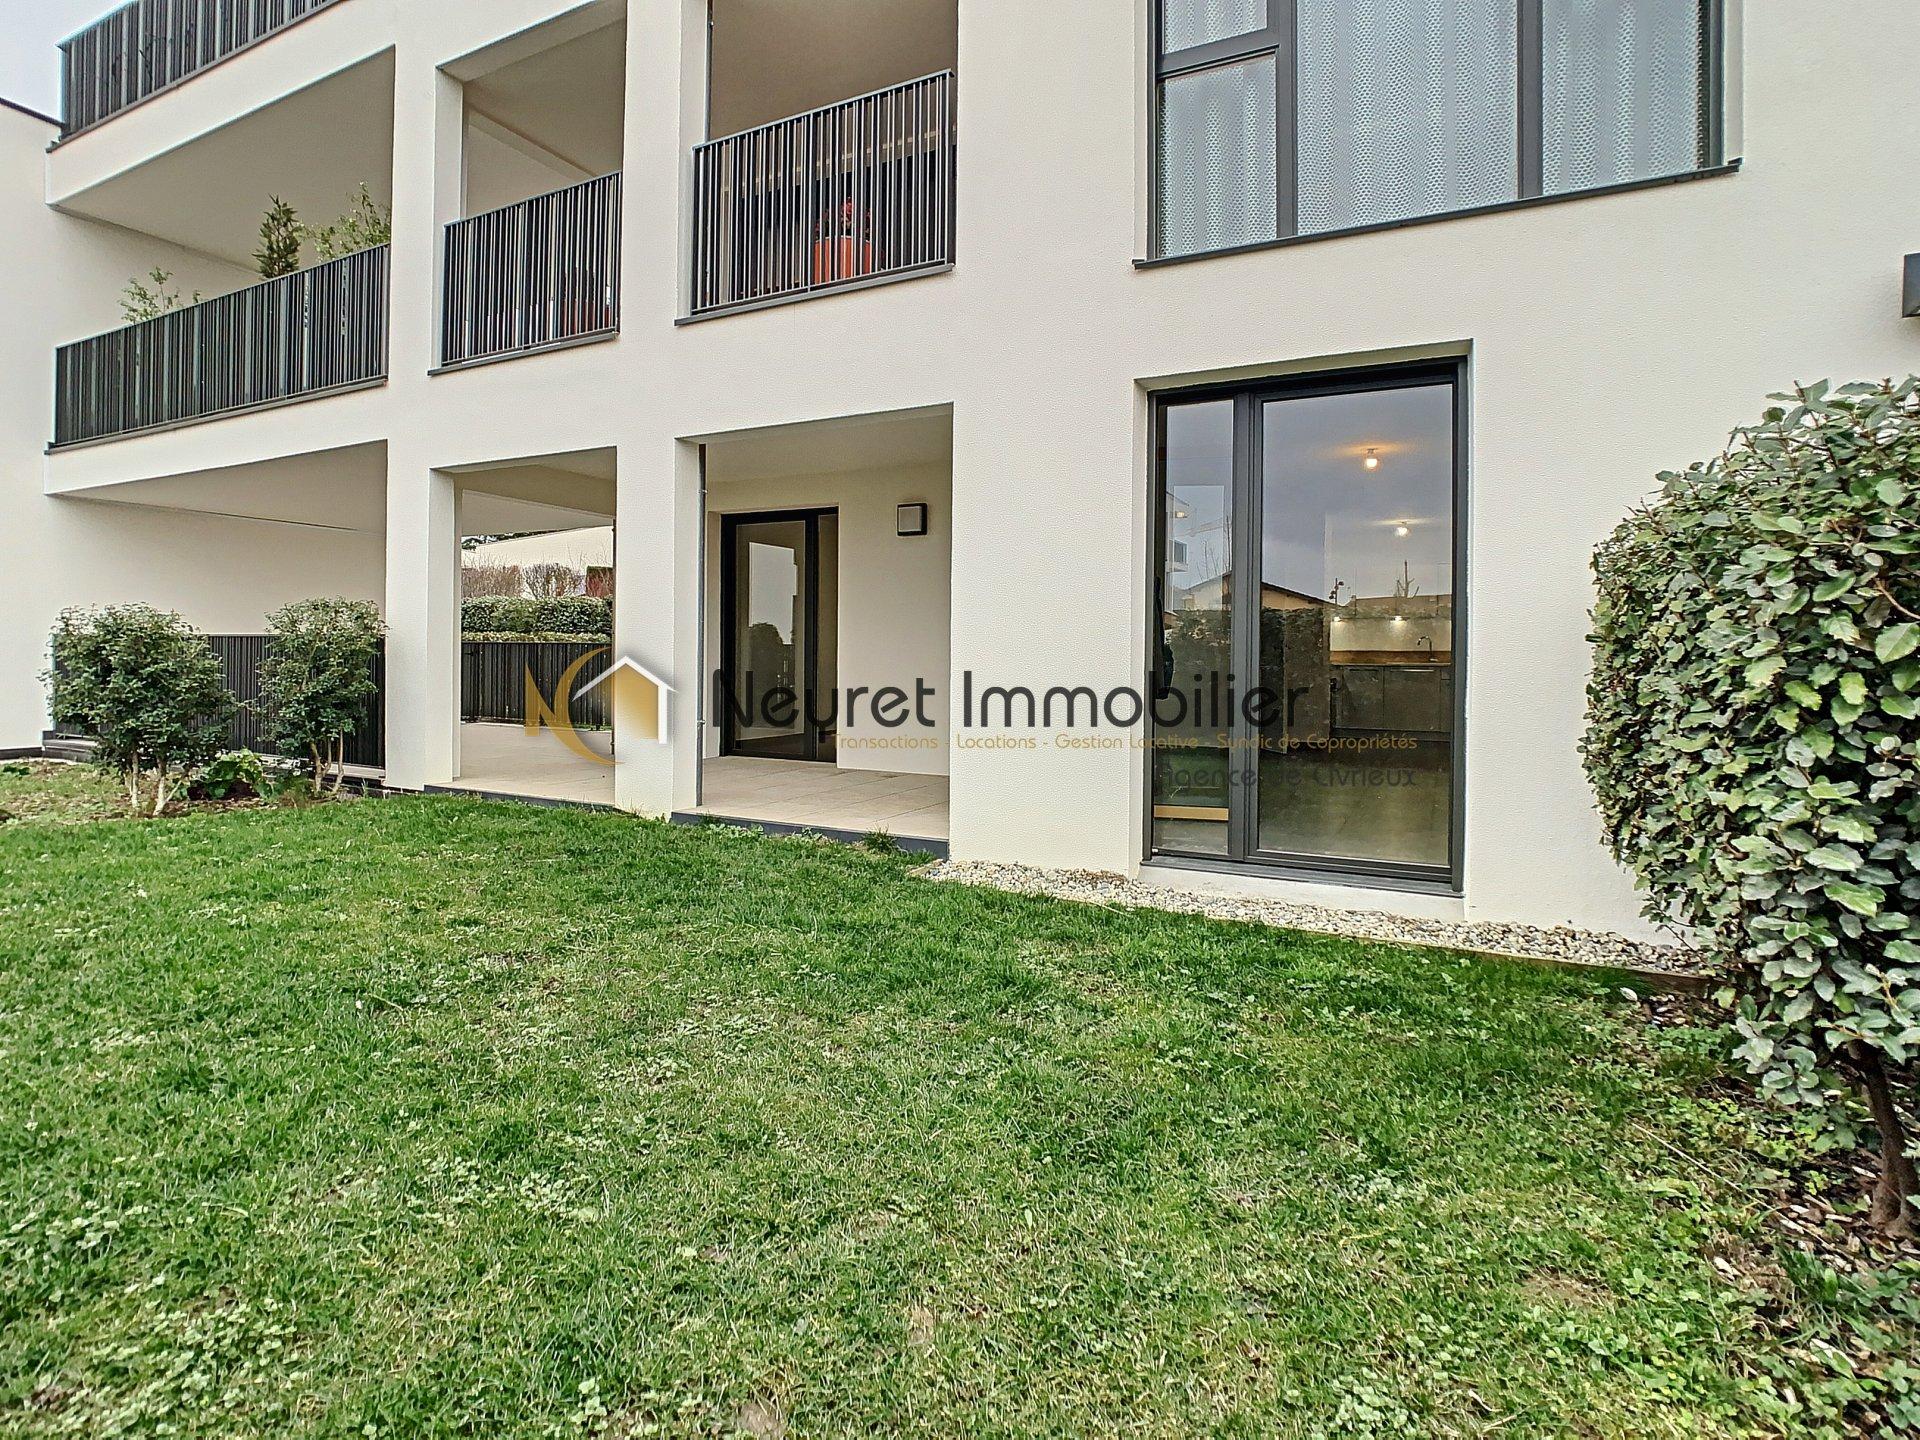 Appartement T2 RDJ CENTRE BOURG DOMMARTIN